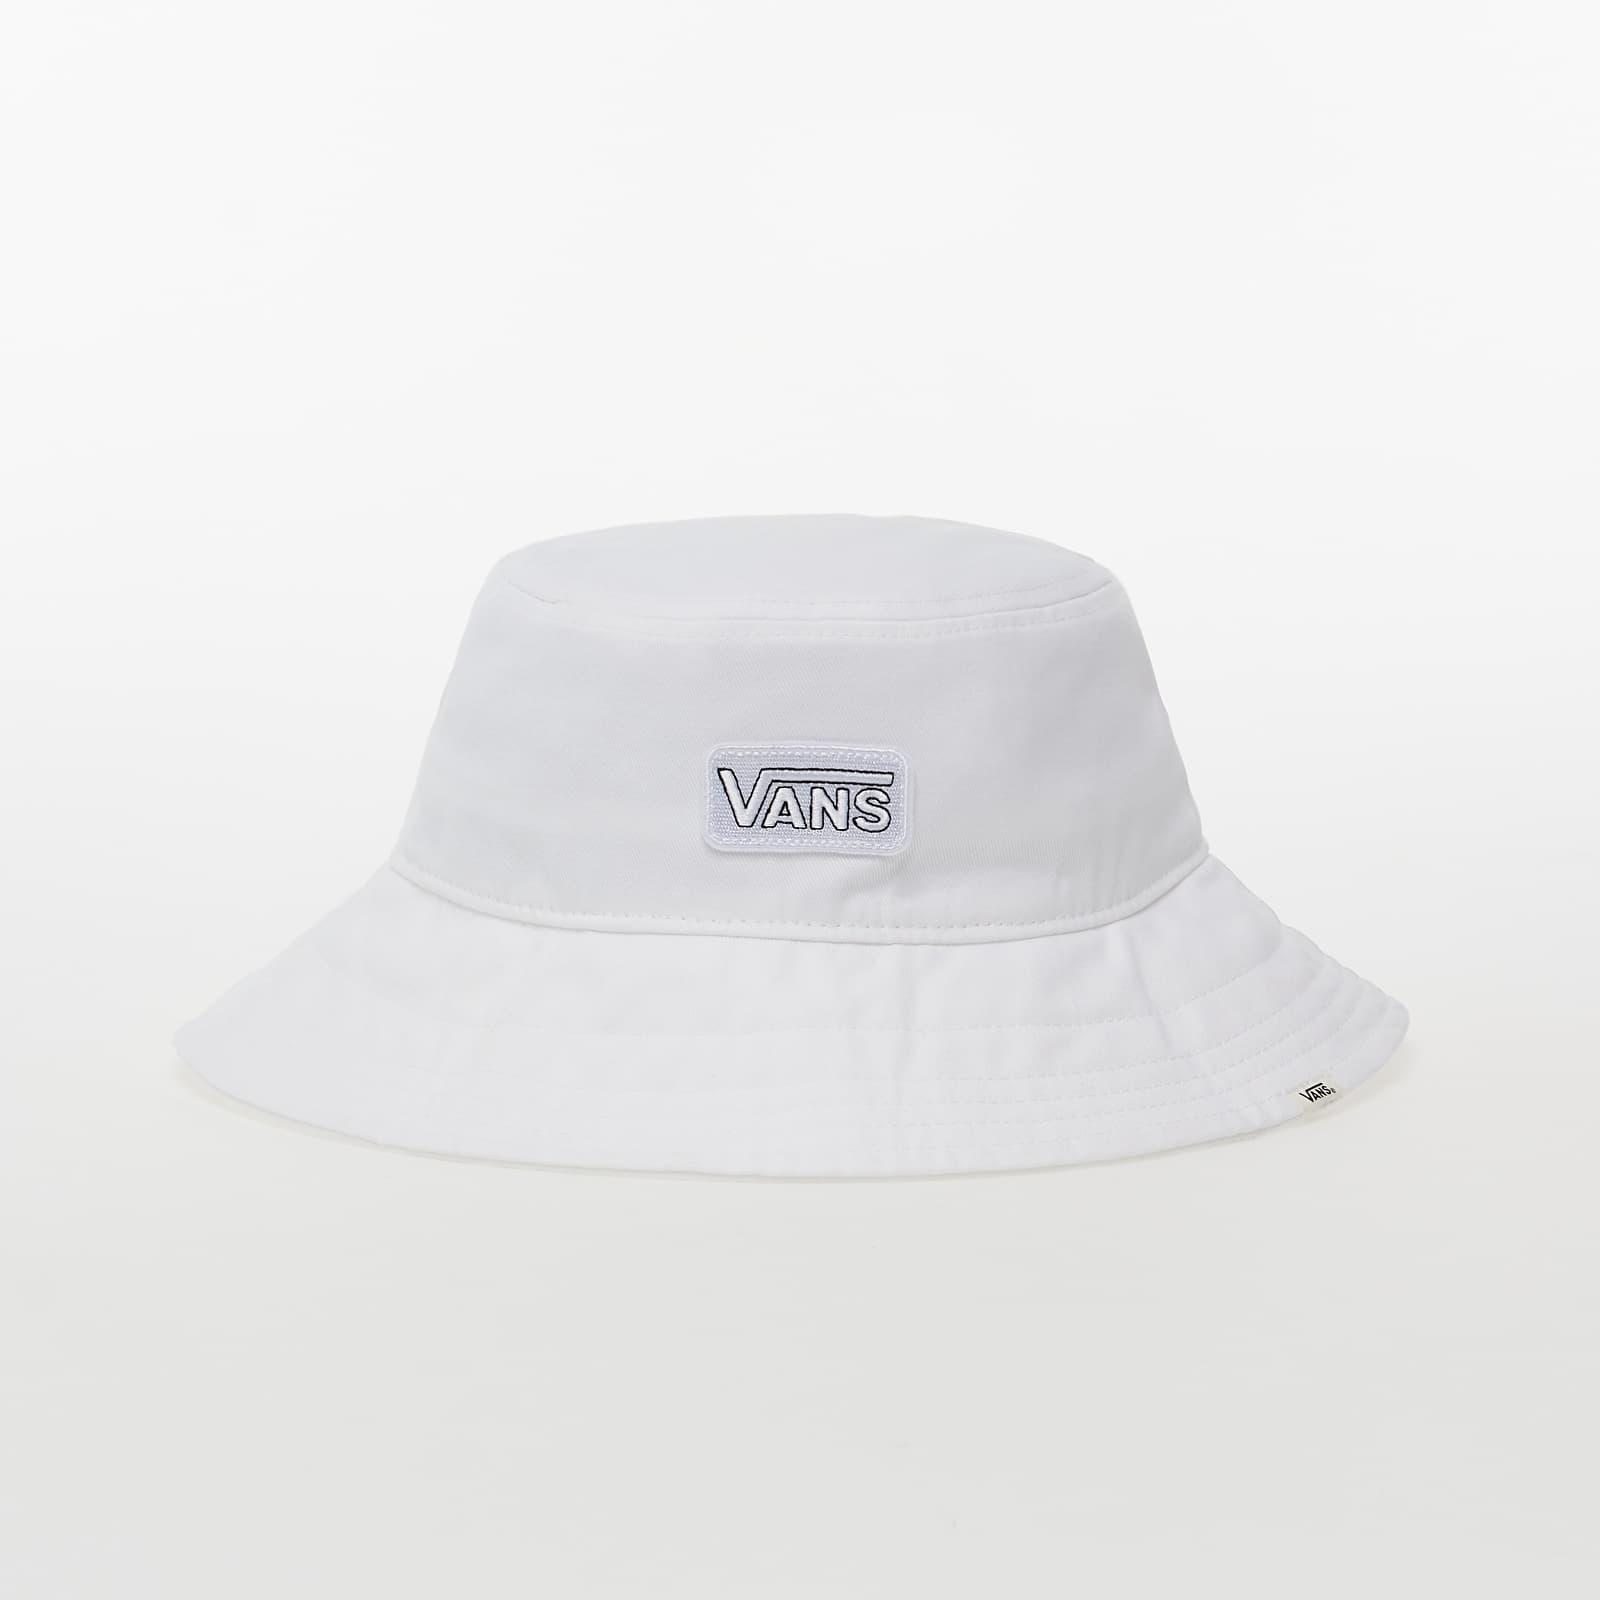 Vans Diy Bucket Hat White, Multicolour